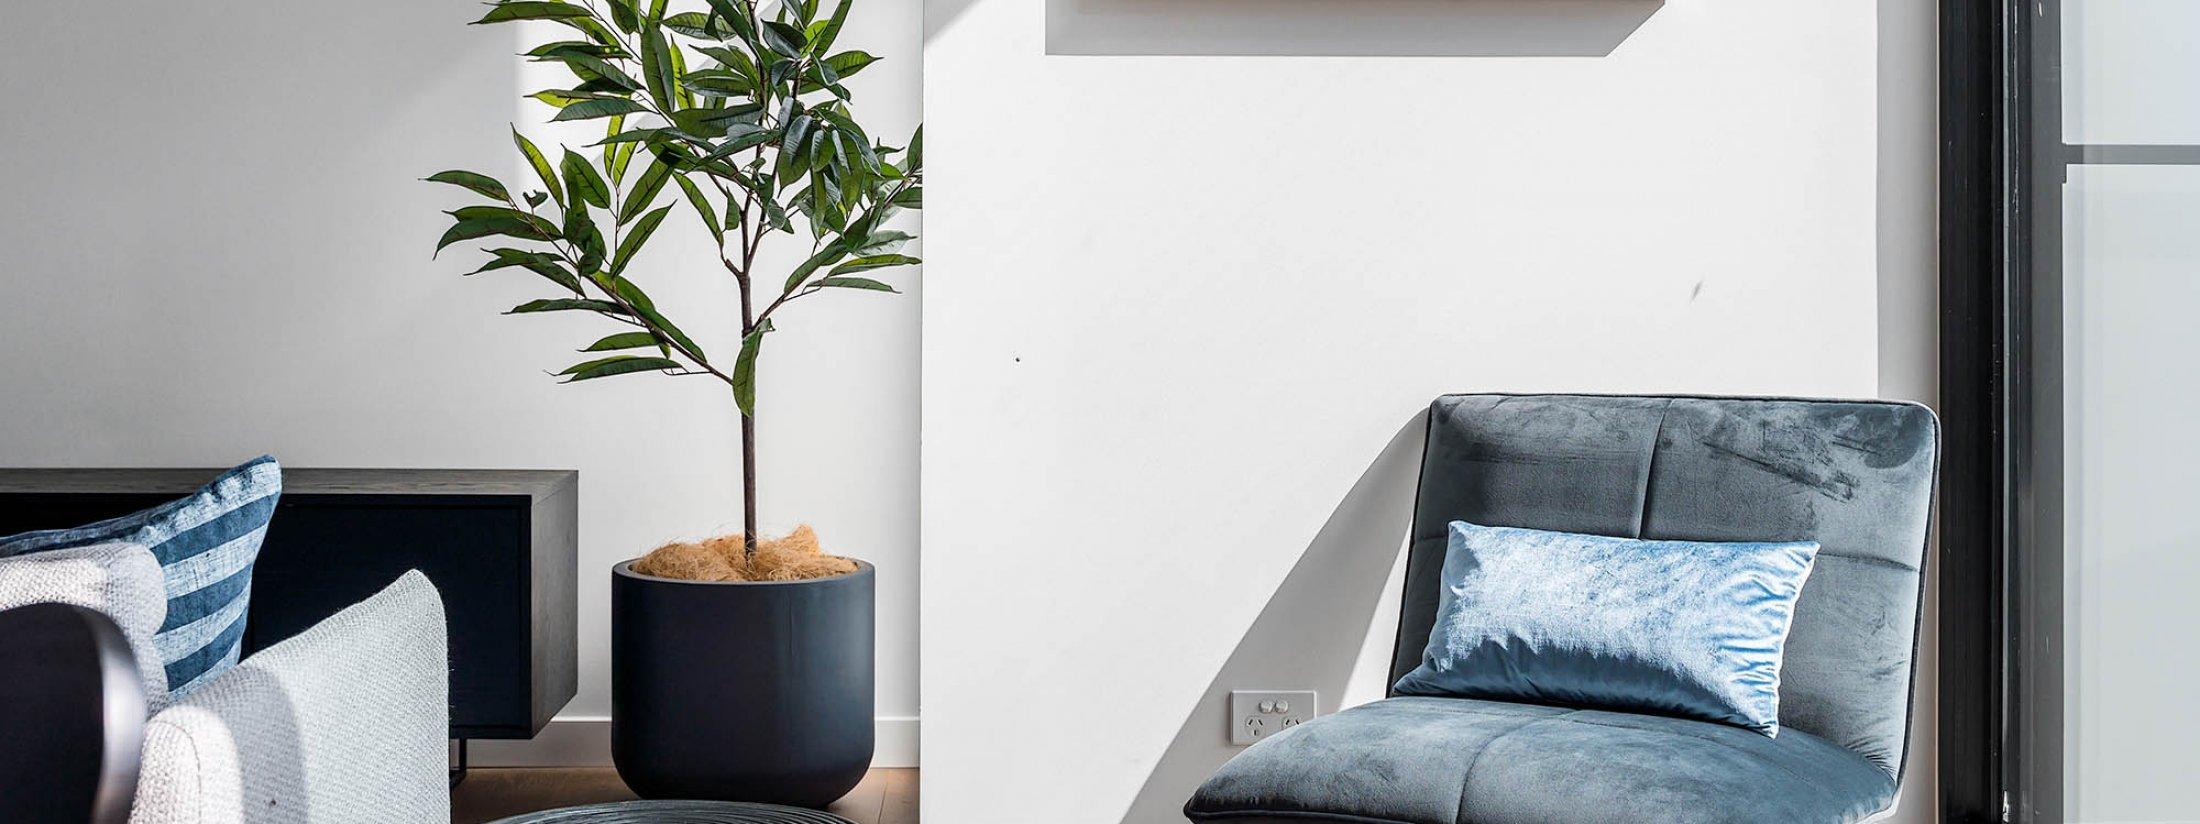 Axel Apartments - The Radnor - Glen Iris - Living Area g